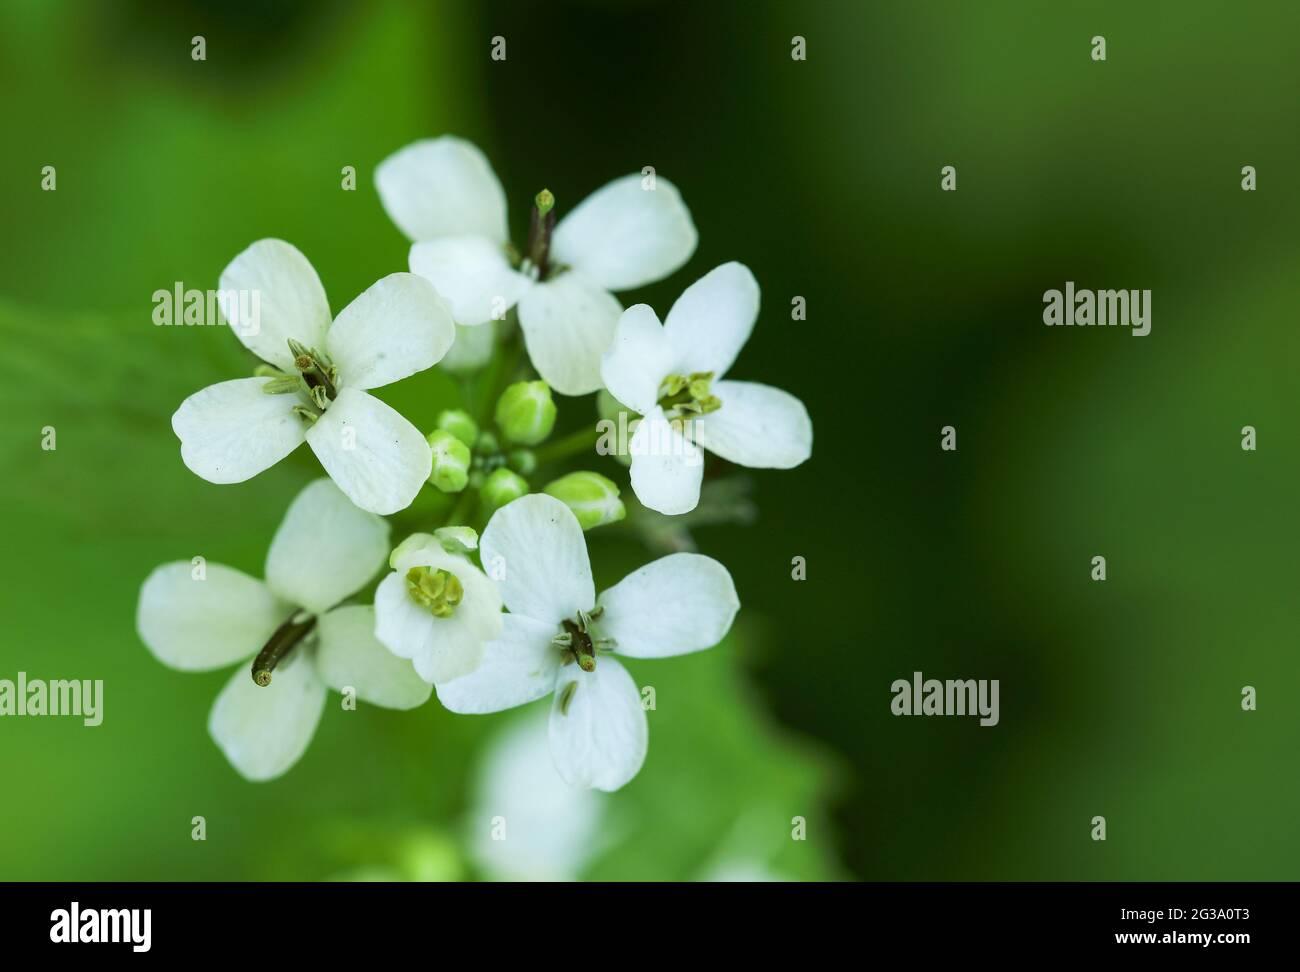 Garlic mustard (Alliaria petiolata) Stock Photo